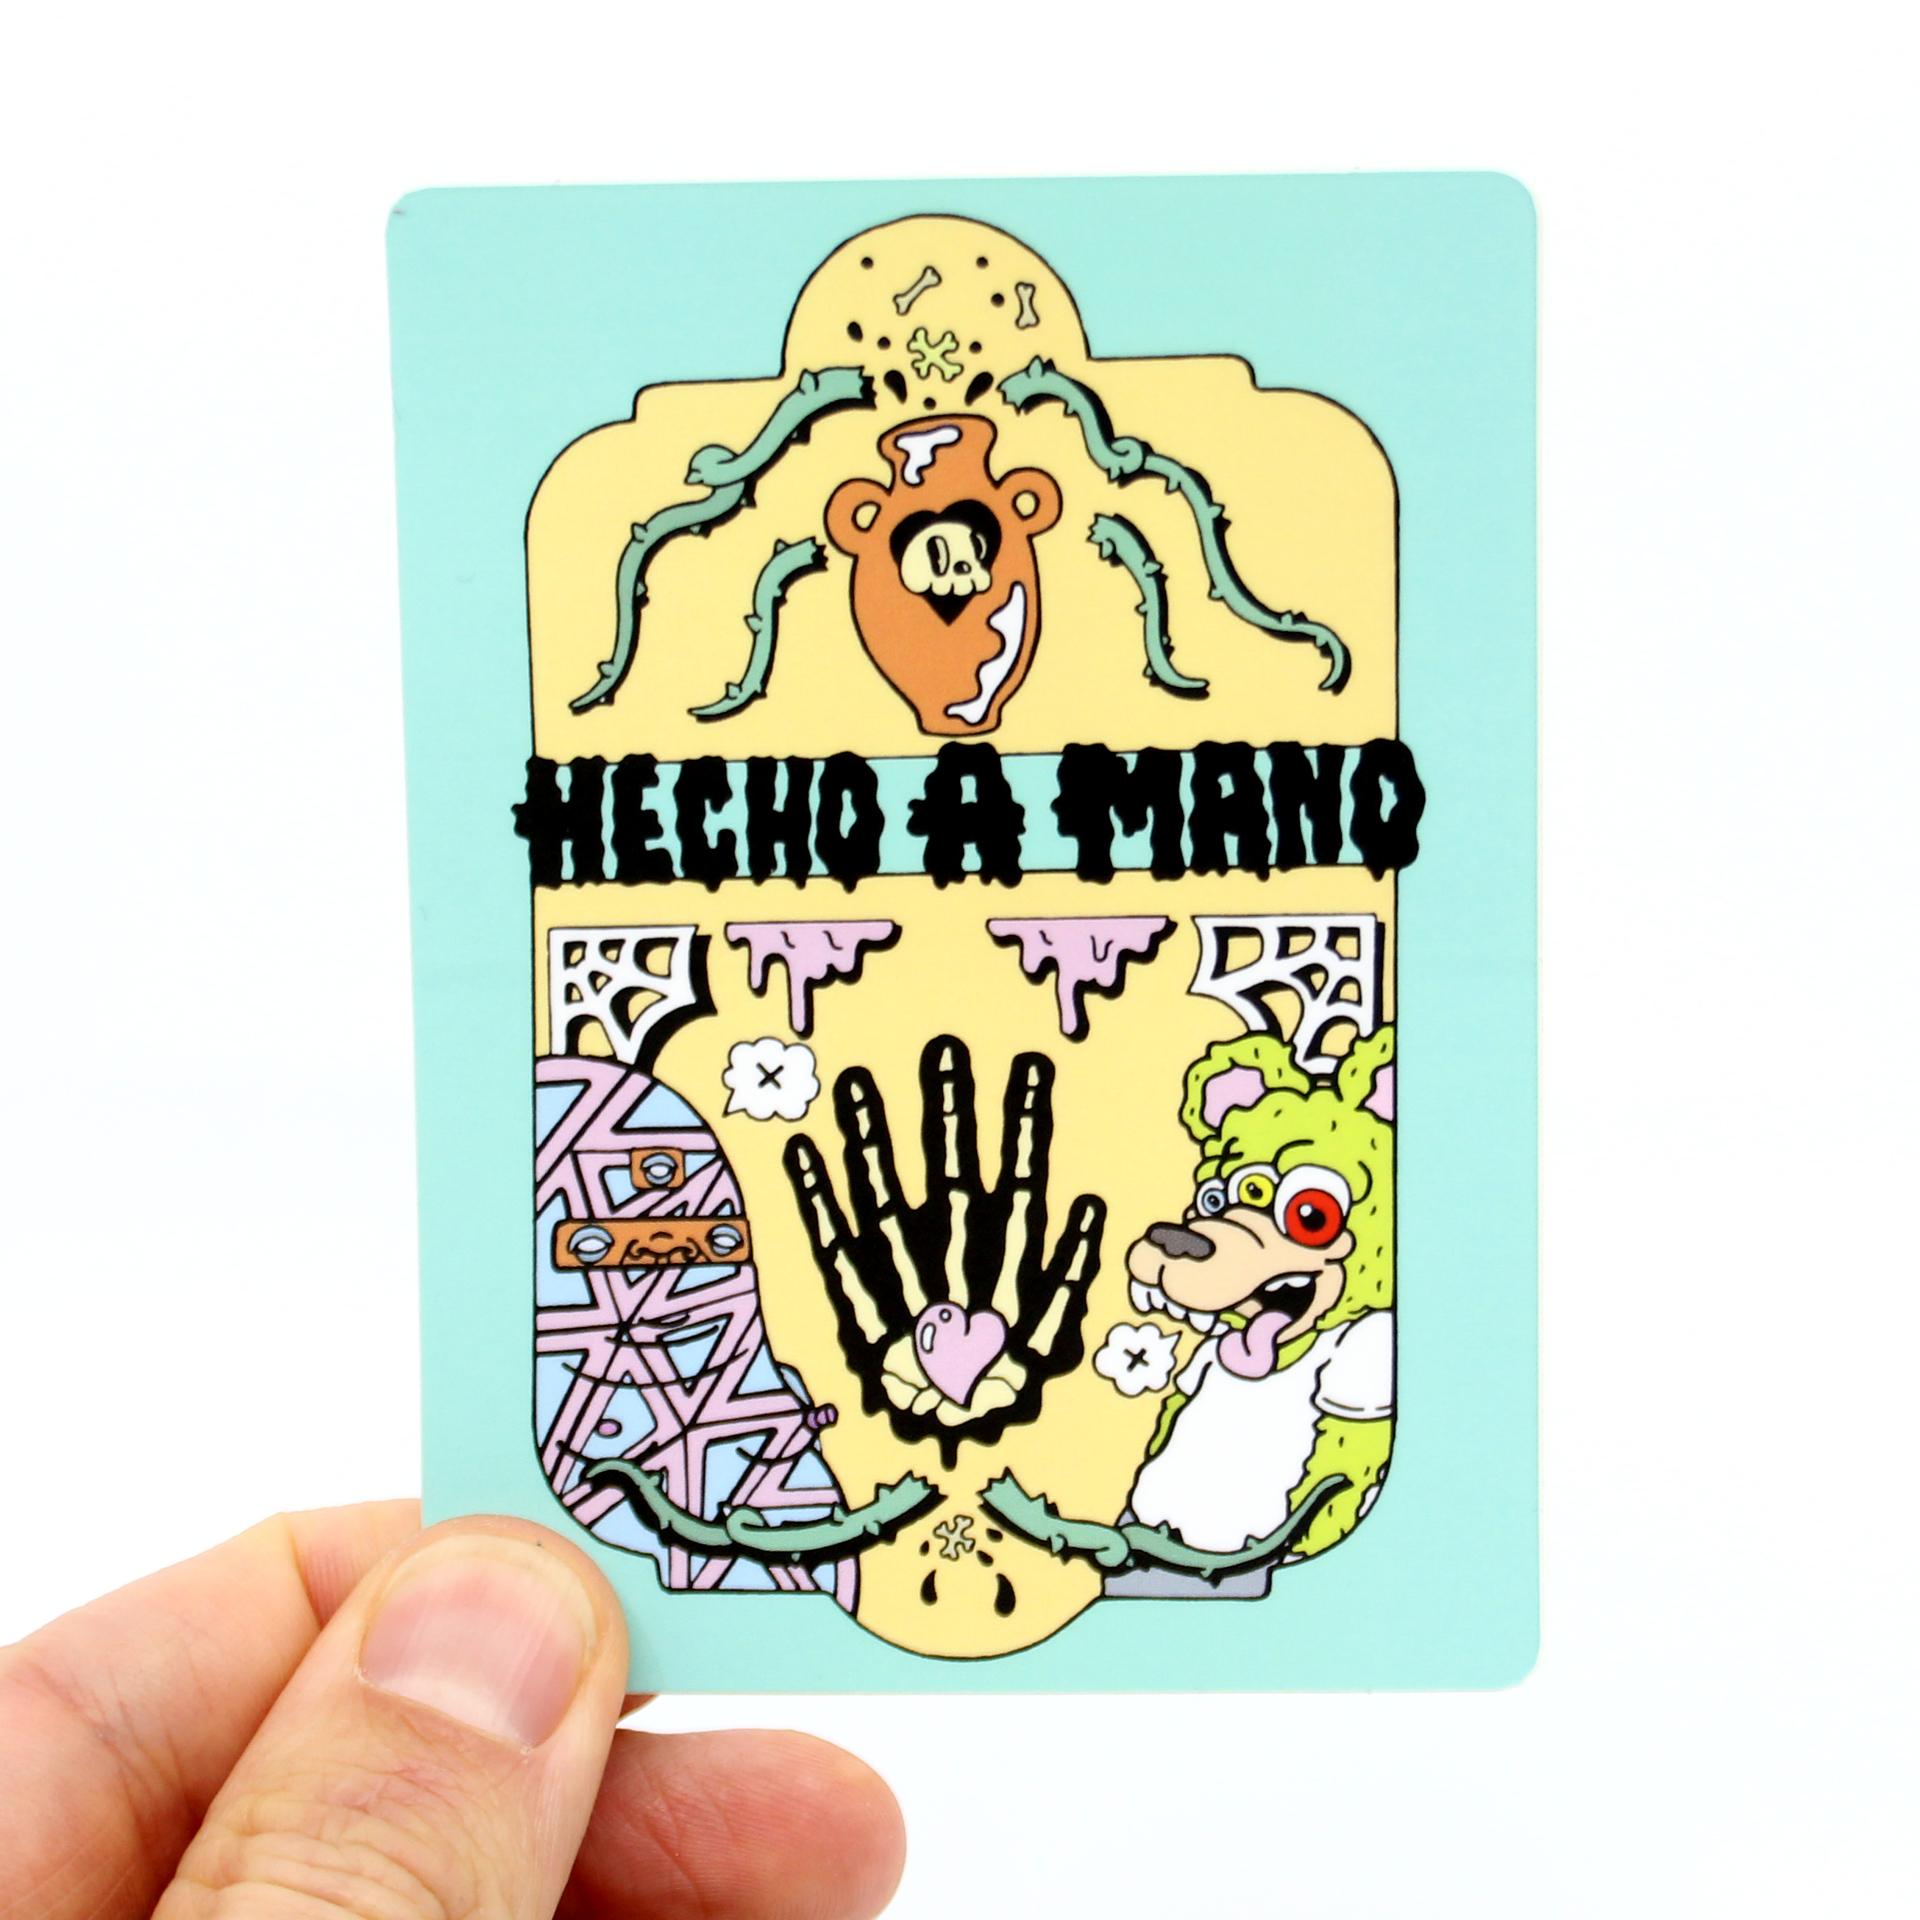 Logo Sticker (Funko Roasto Remix) by Hecho a Mano